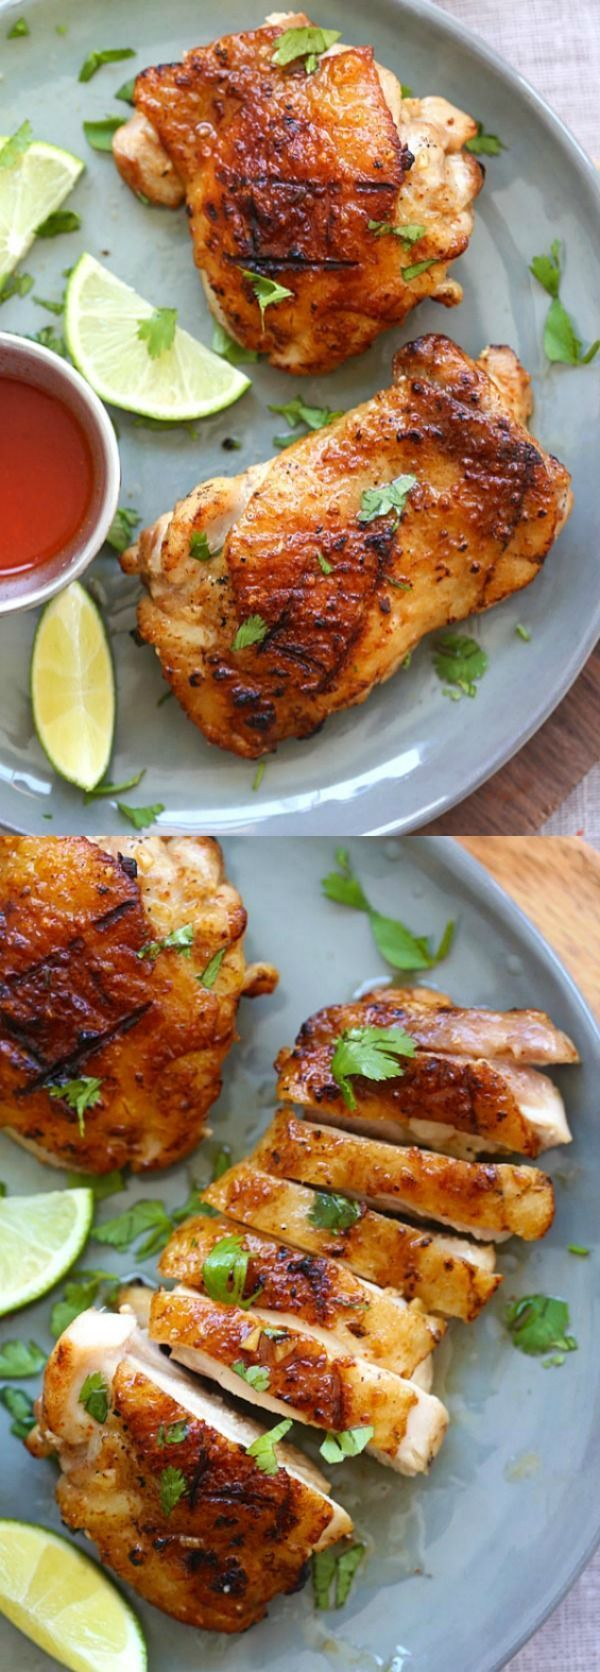 Tequila Lime Chicken – amazing chicken marinated with tequila, lime and garlic. This tequila lime chicken recipe tastes better than restaurant's   http://rasamalaysia.com